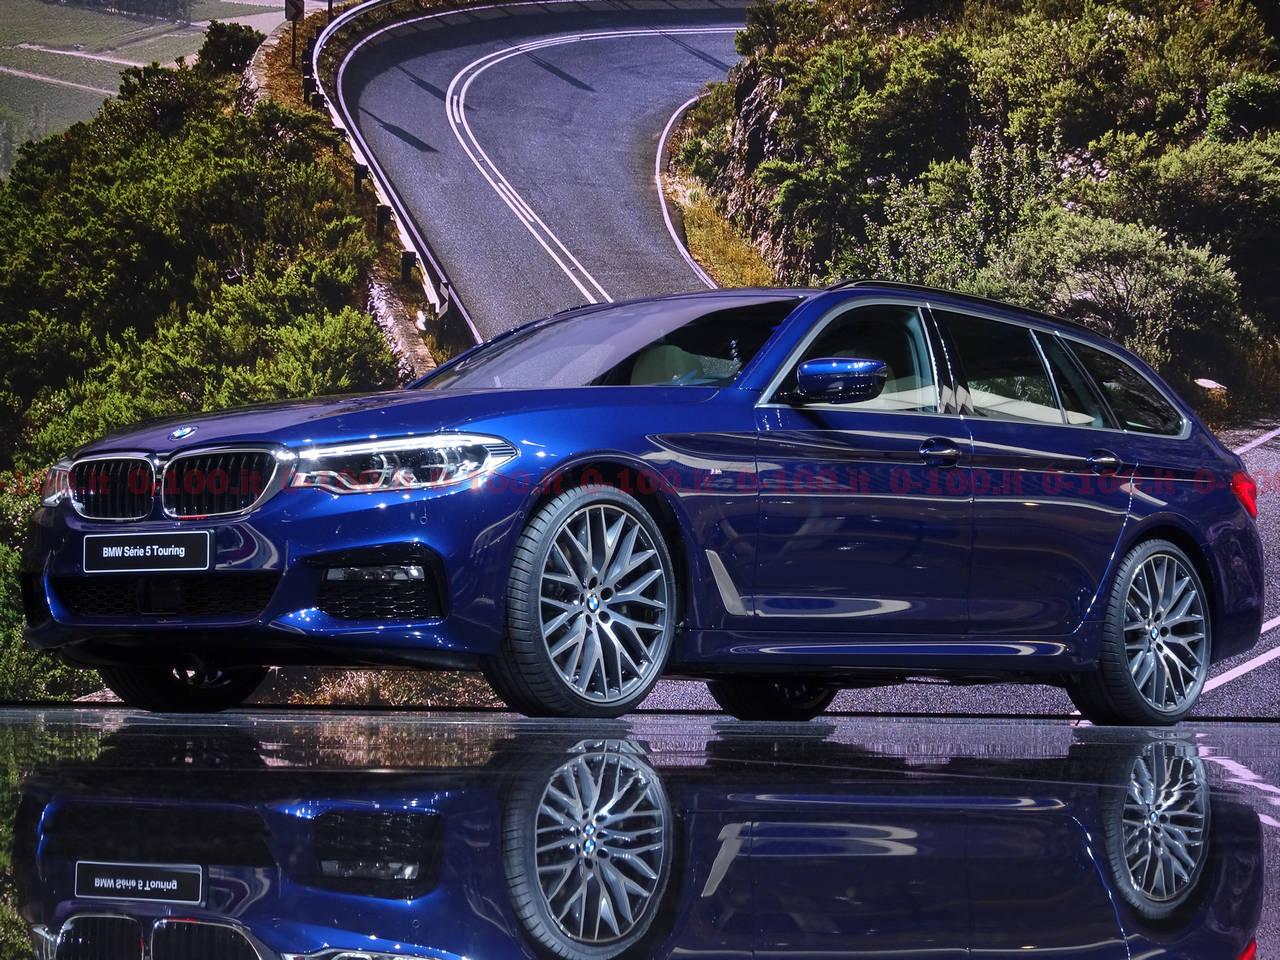 Ginevra-geneva-geneve-2017-BMW_Serie-5-Touring_0-100_4